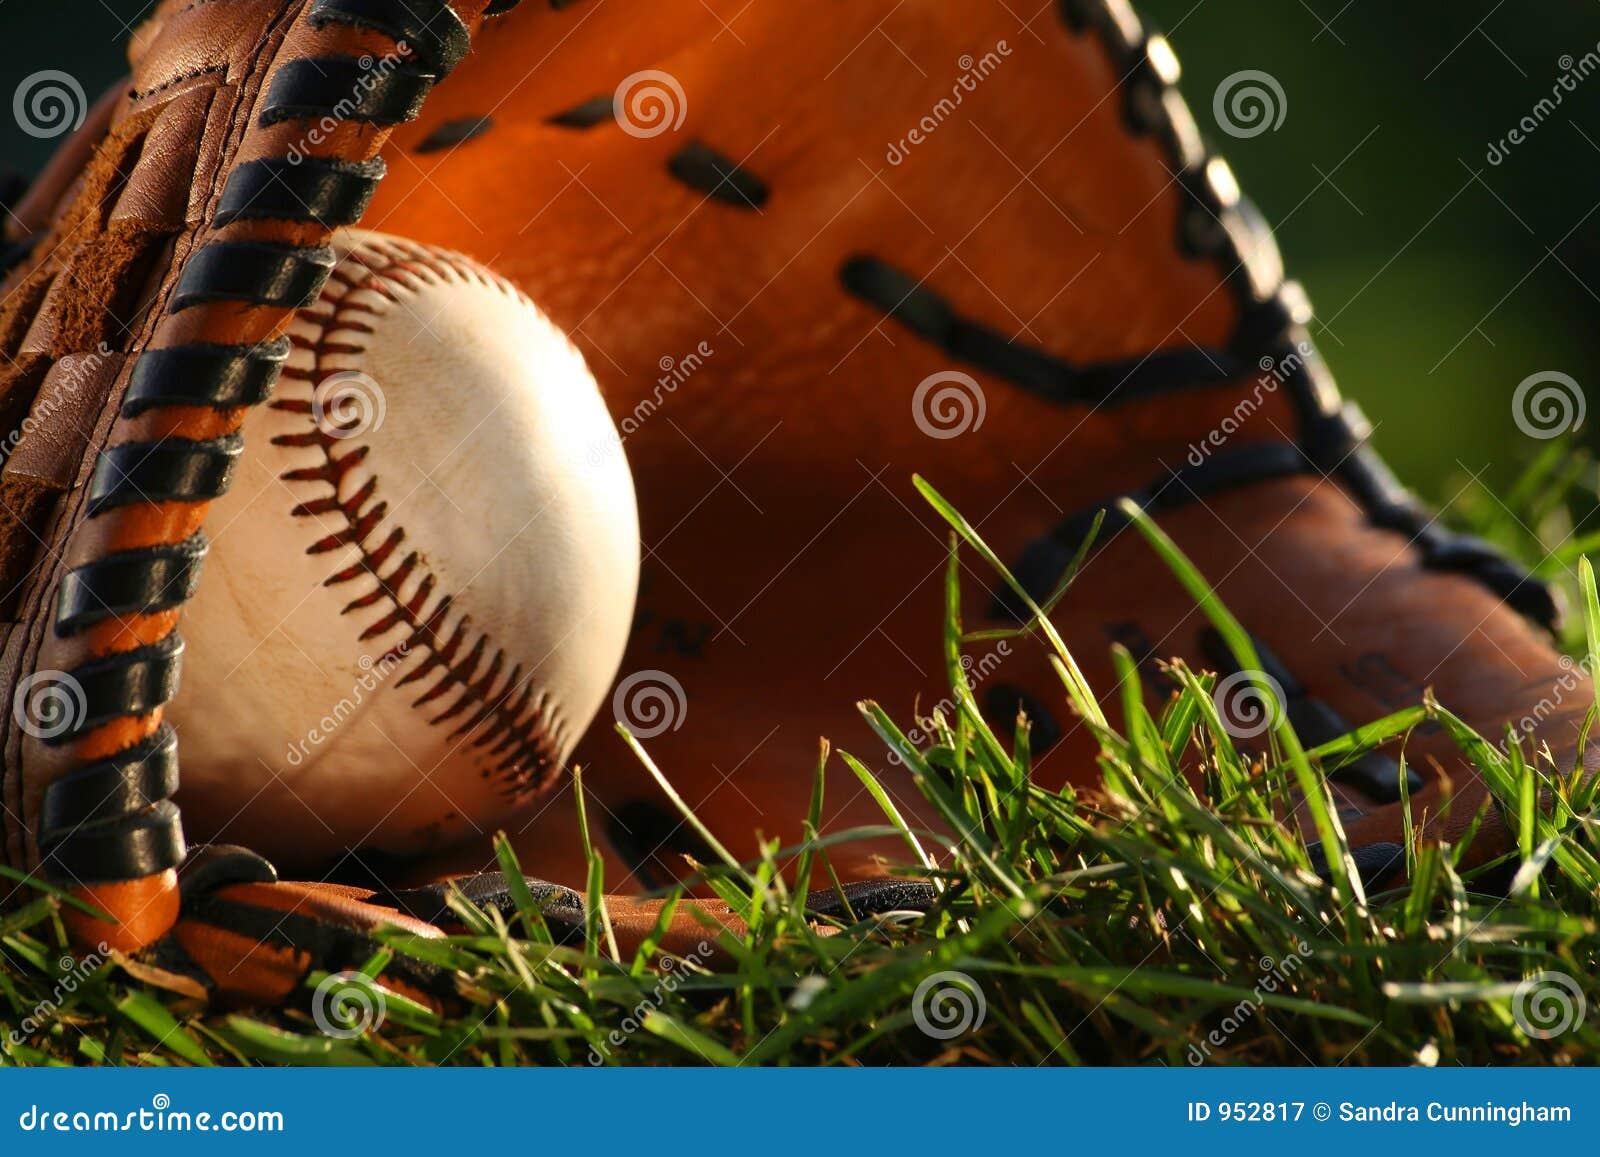 Baseball und Handschuhnahaufnahme